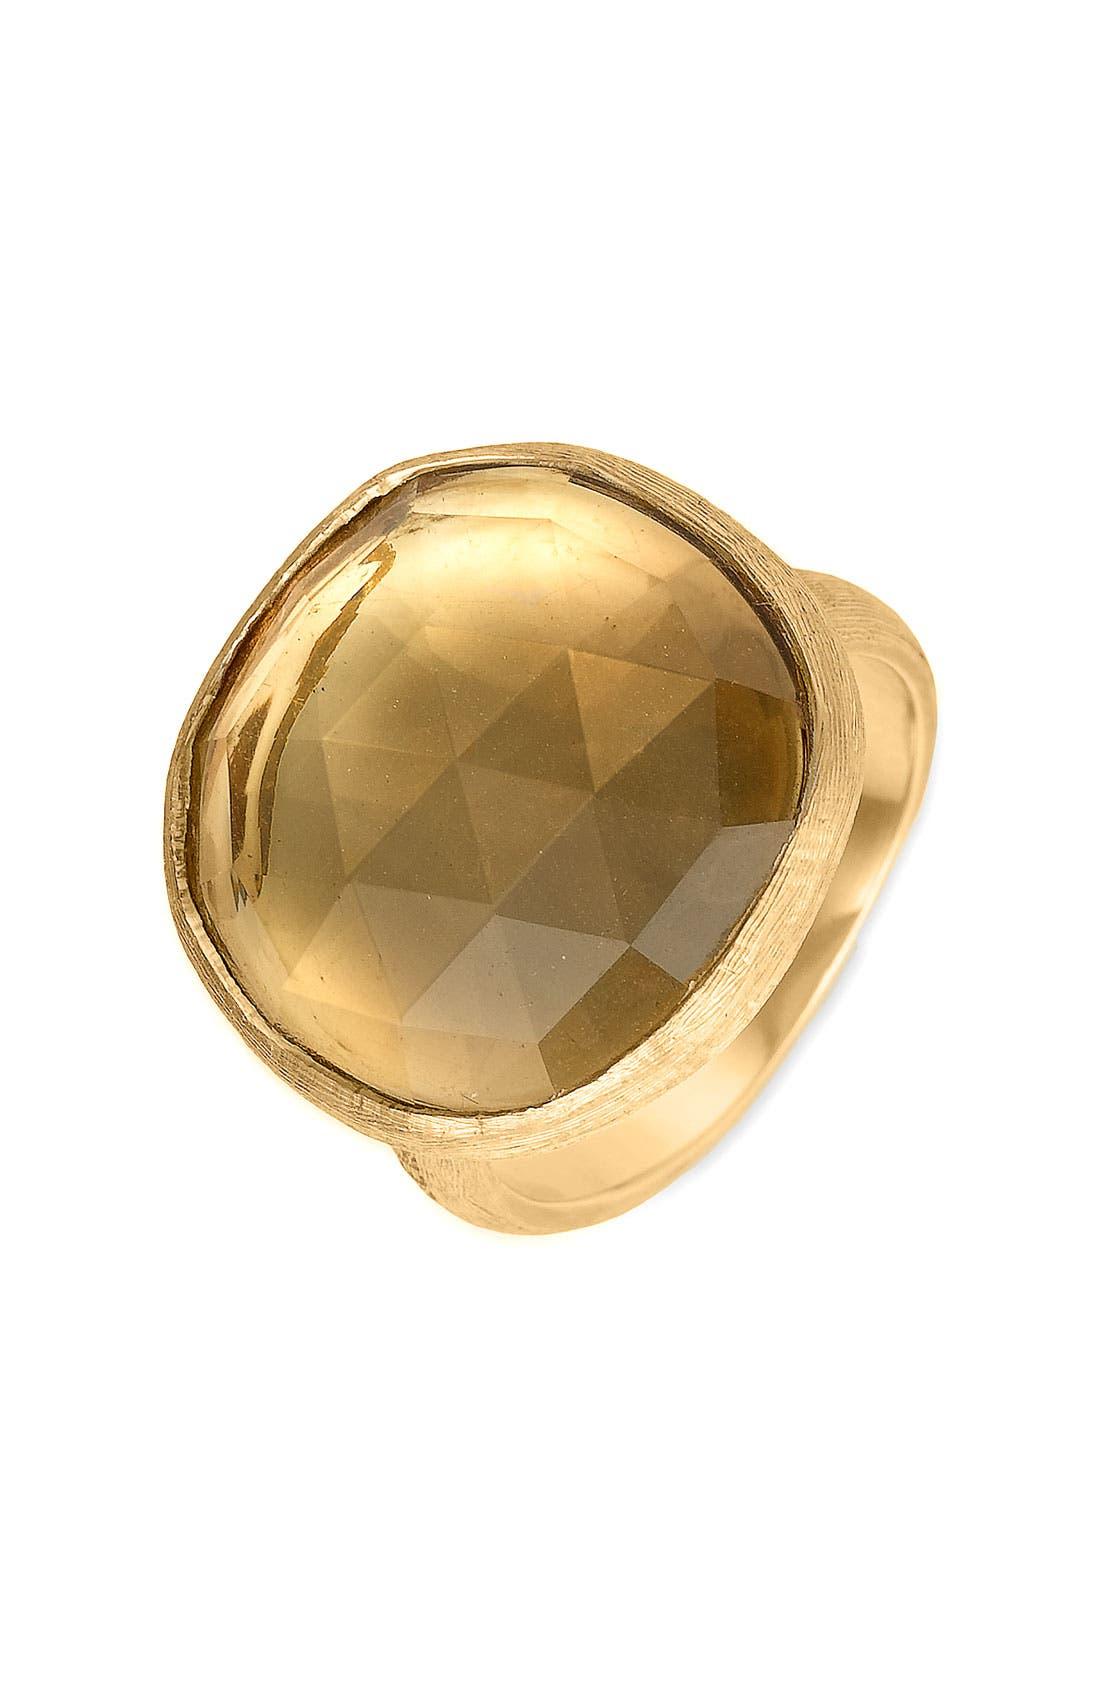 Main Image - Marco Bicego 'Jaipur' Large Citrine Ring